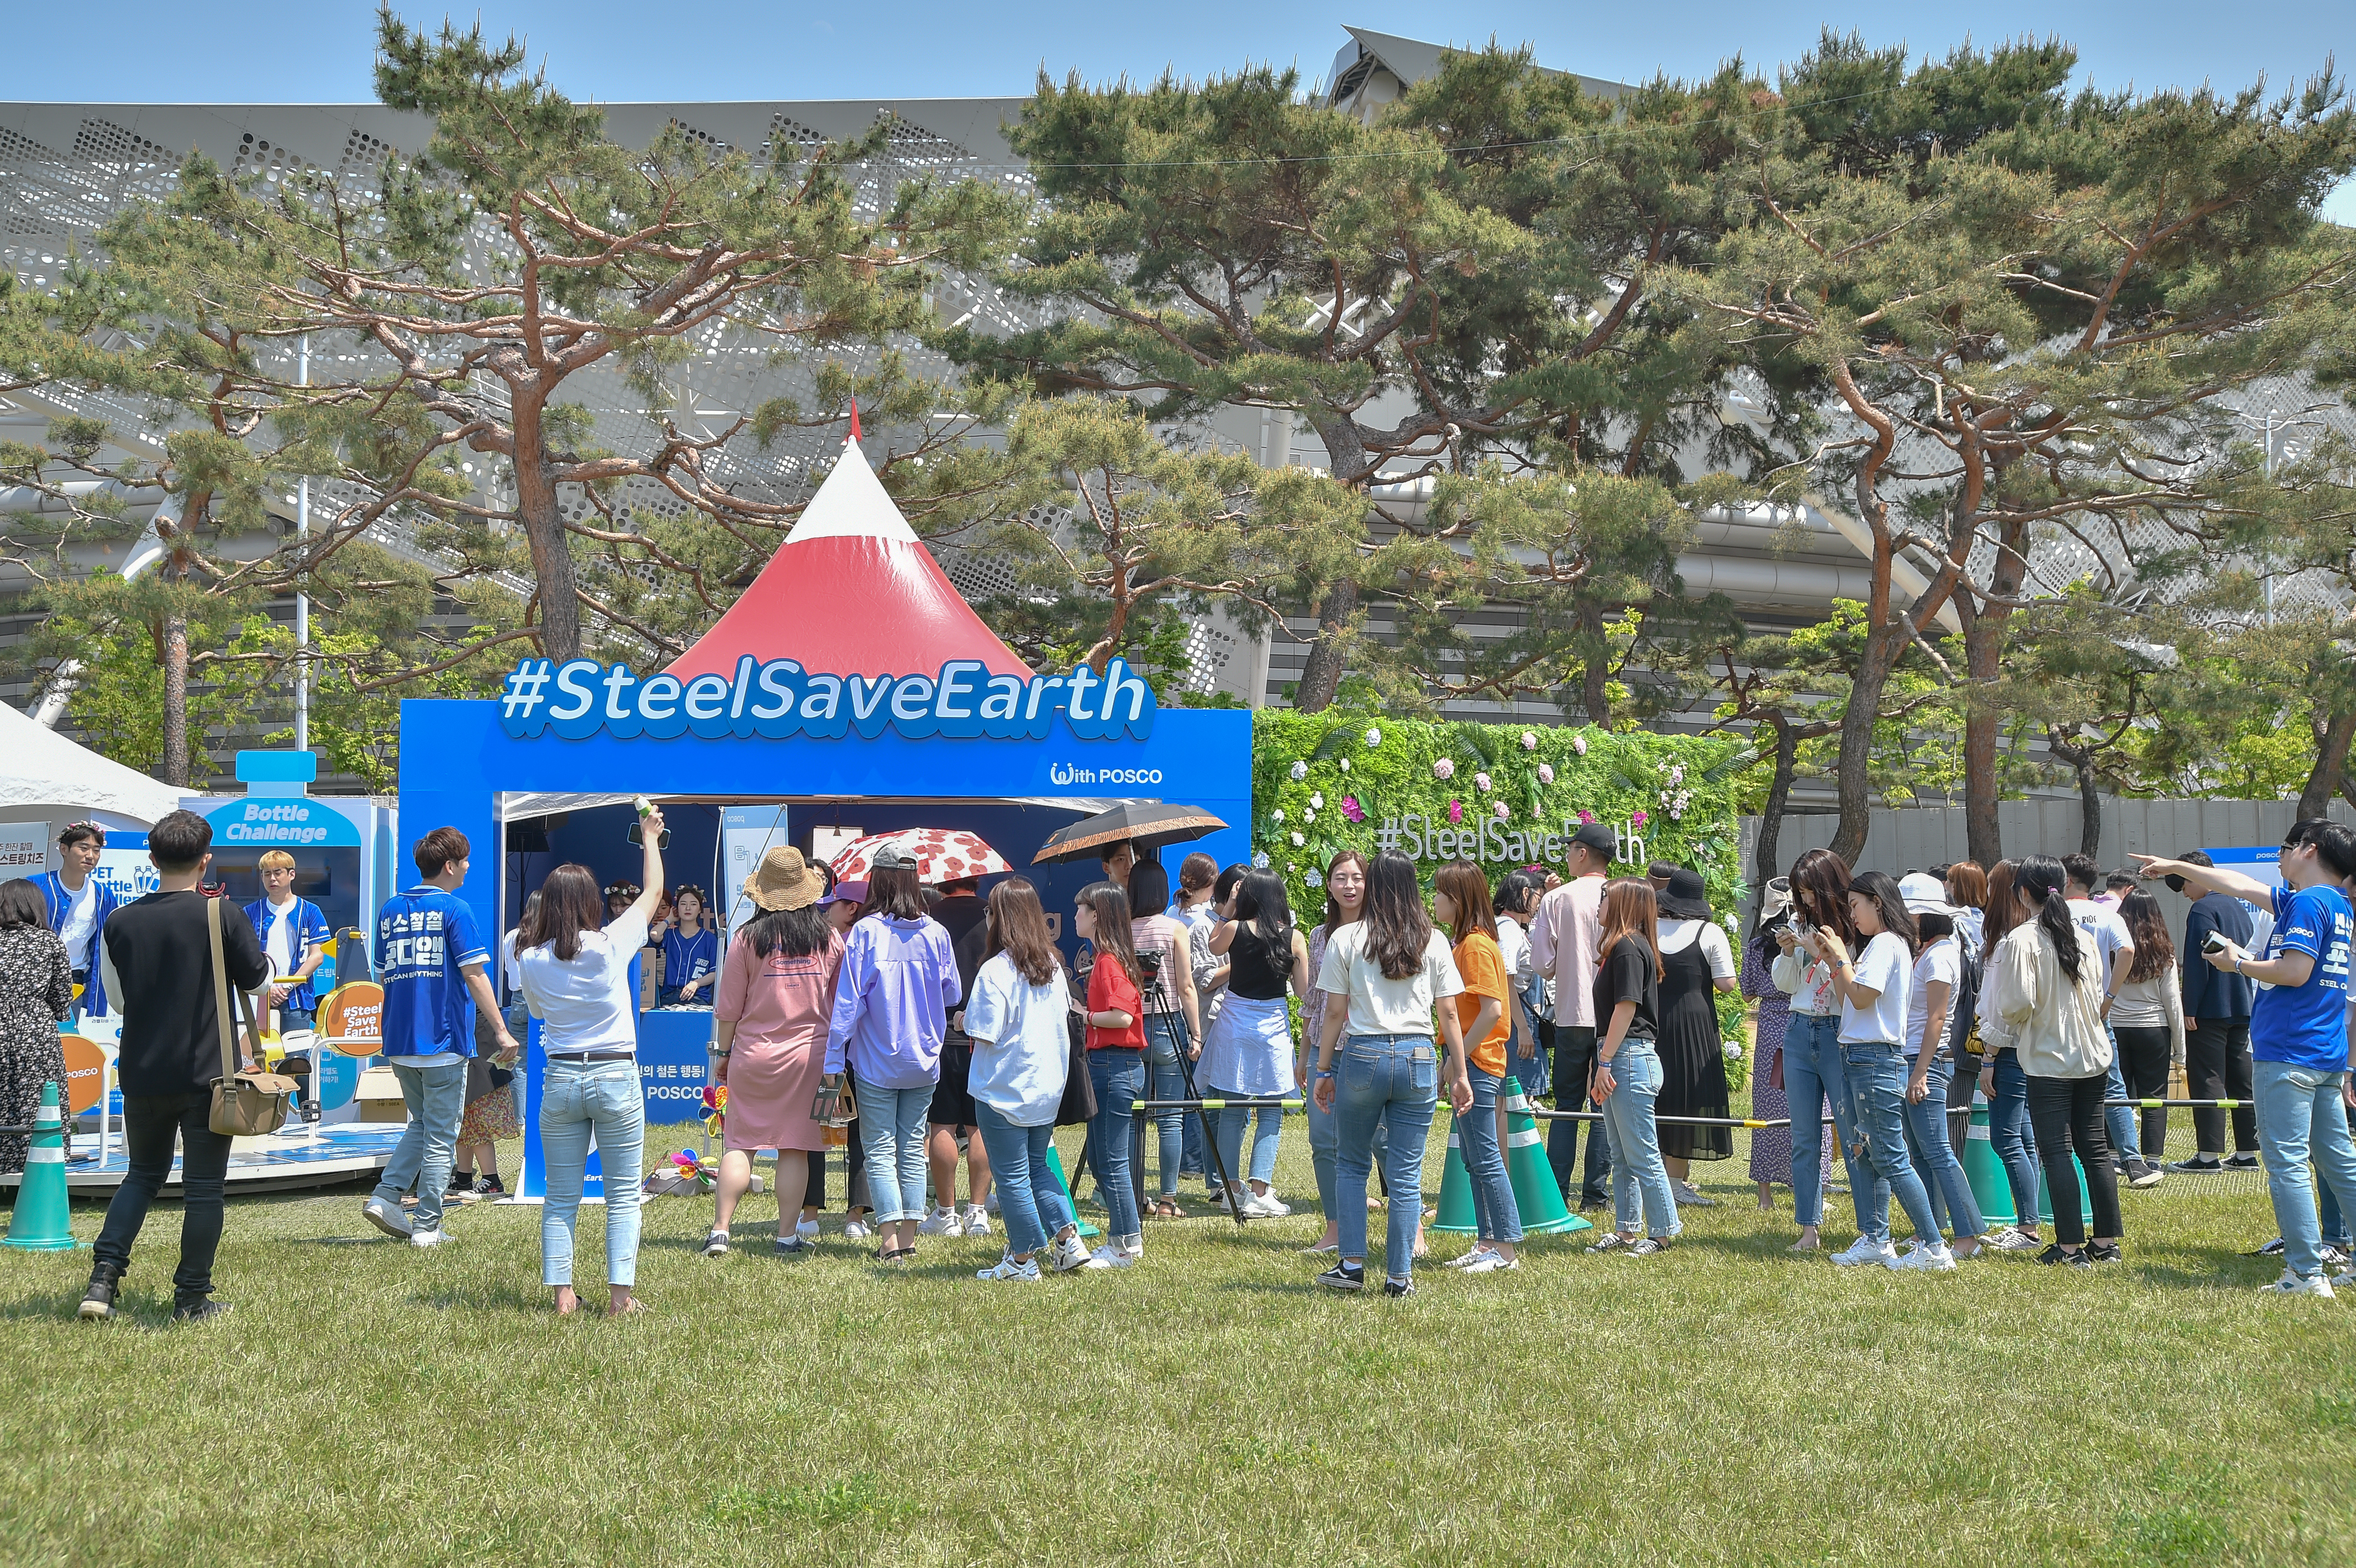 <#SteelSaveEarth With POSCO> 부스 앞에 모여든 사람들 사진